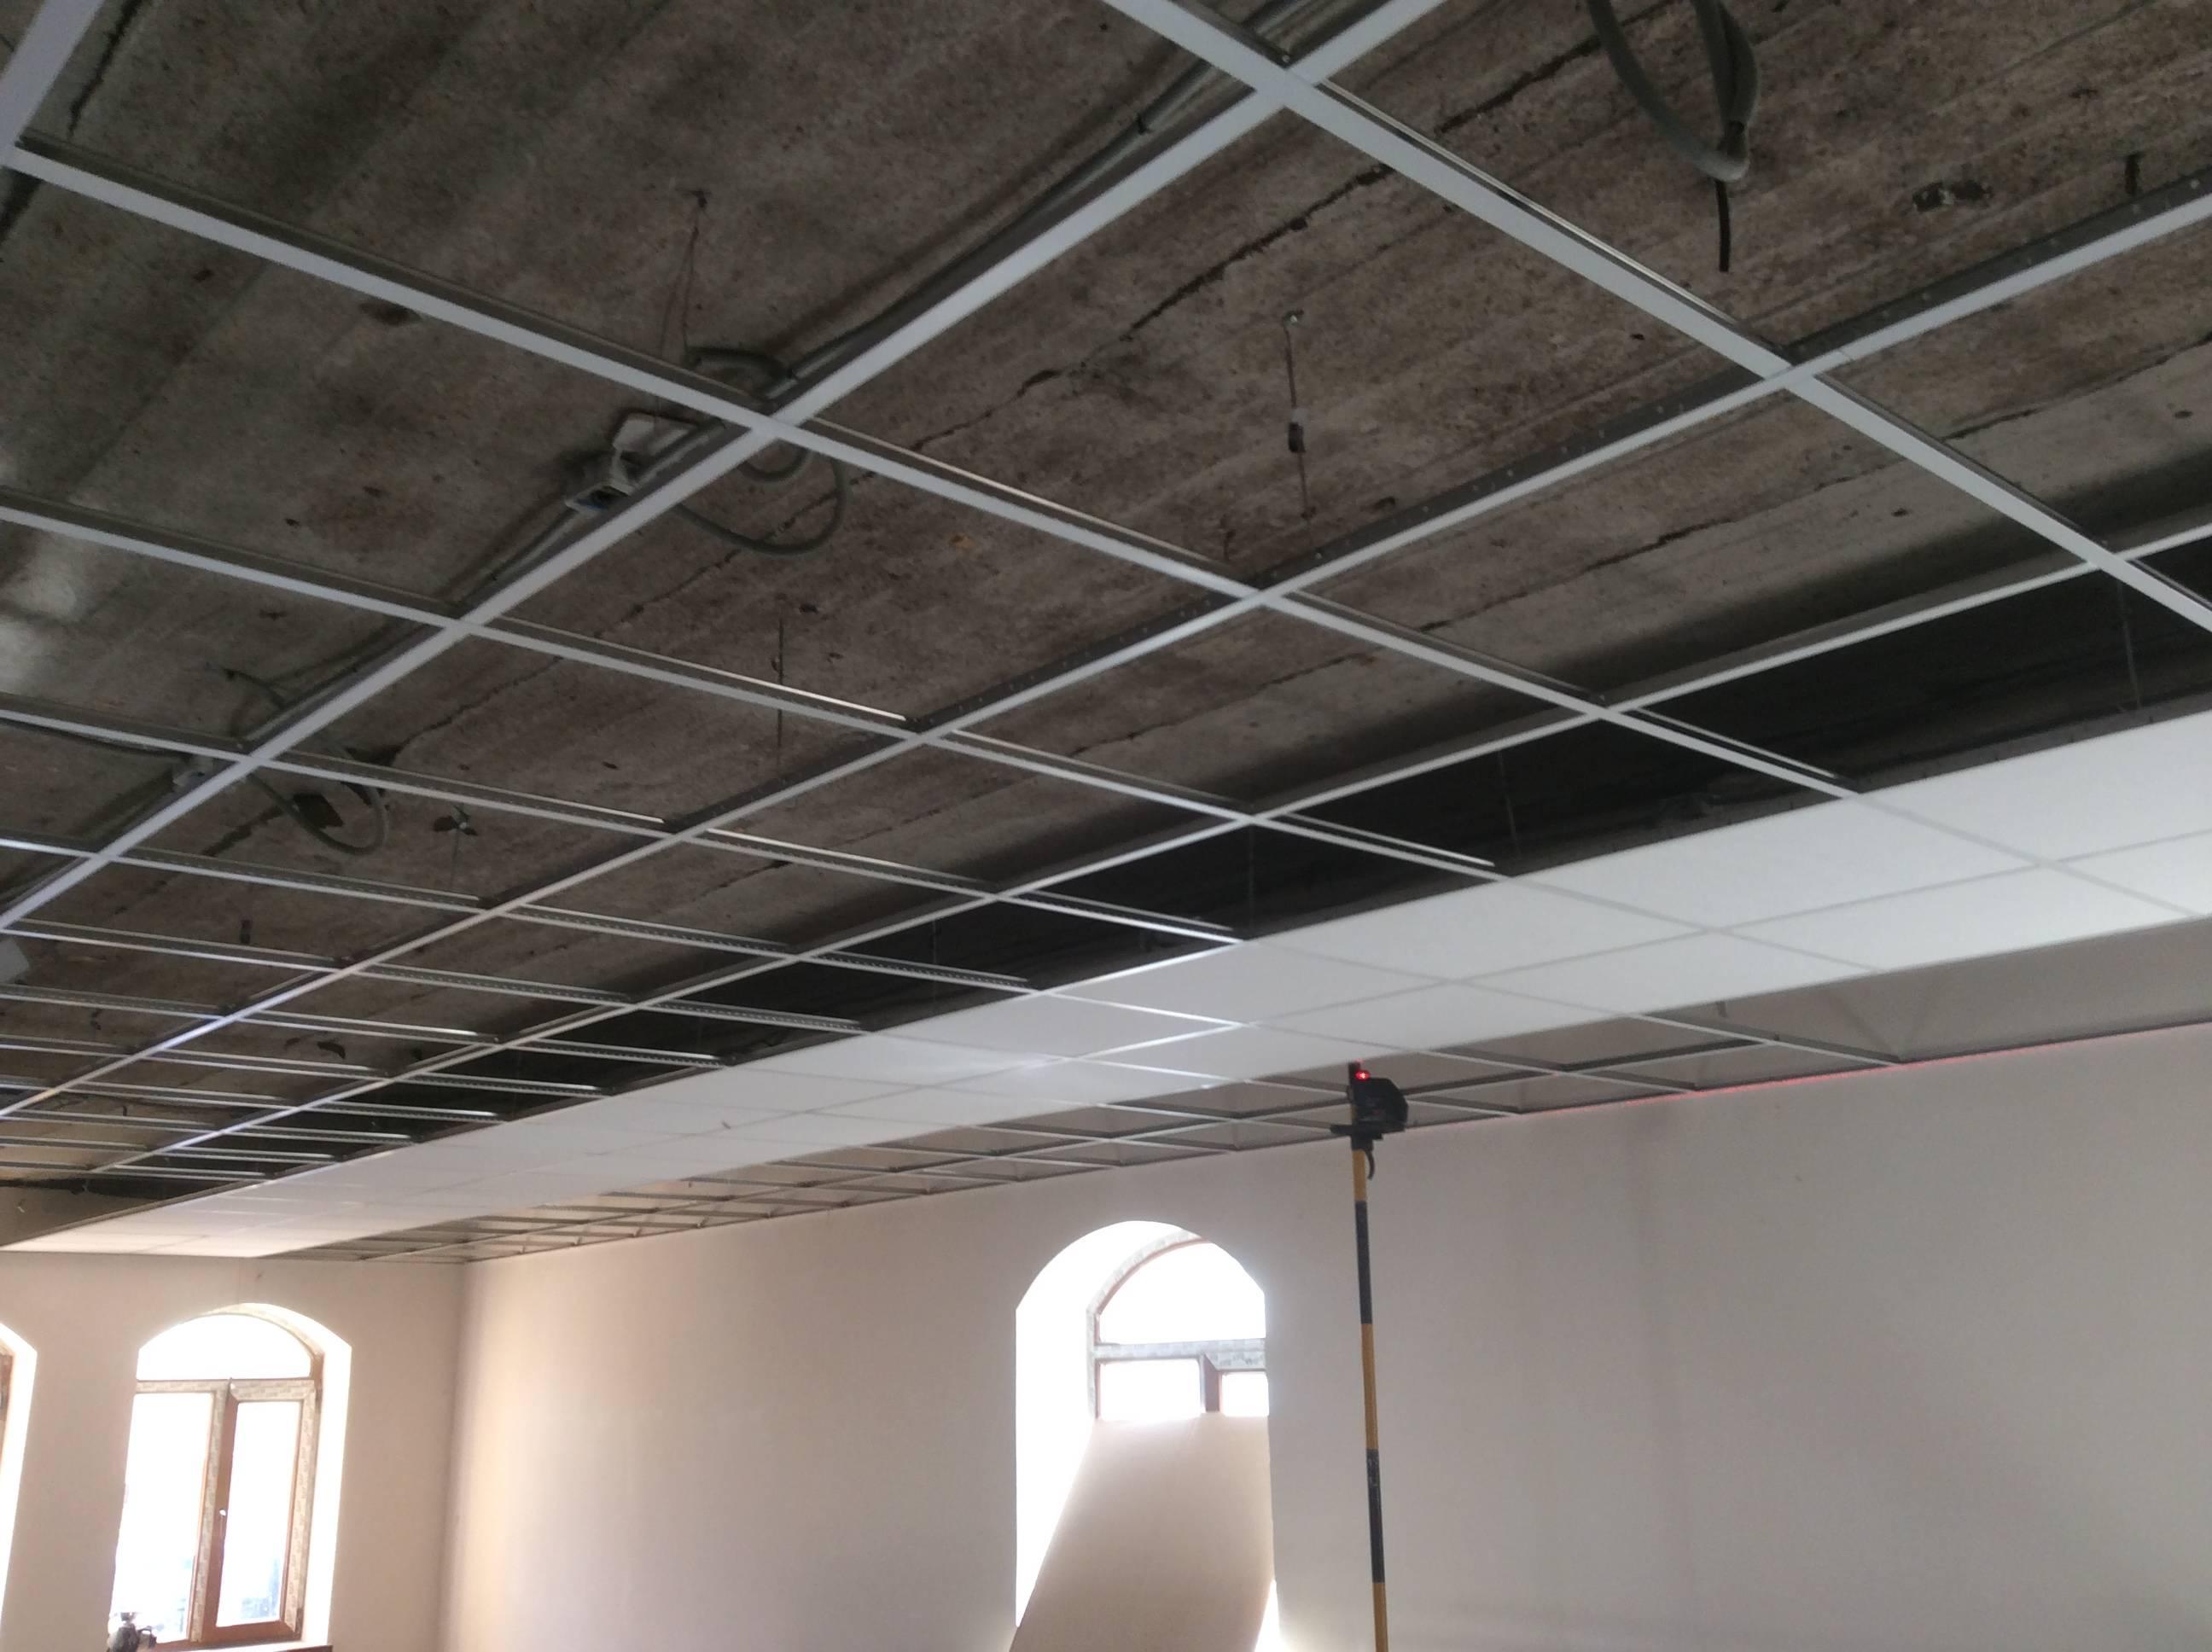 Потолок армстронг подвесной: цена за м2 монтажа, видео и расценки на установку